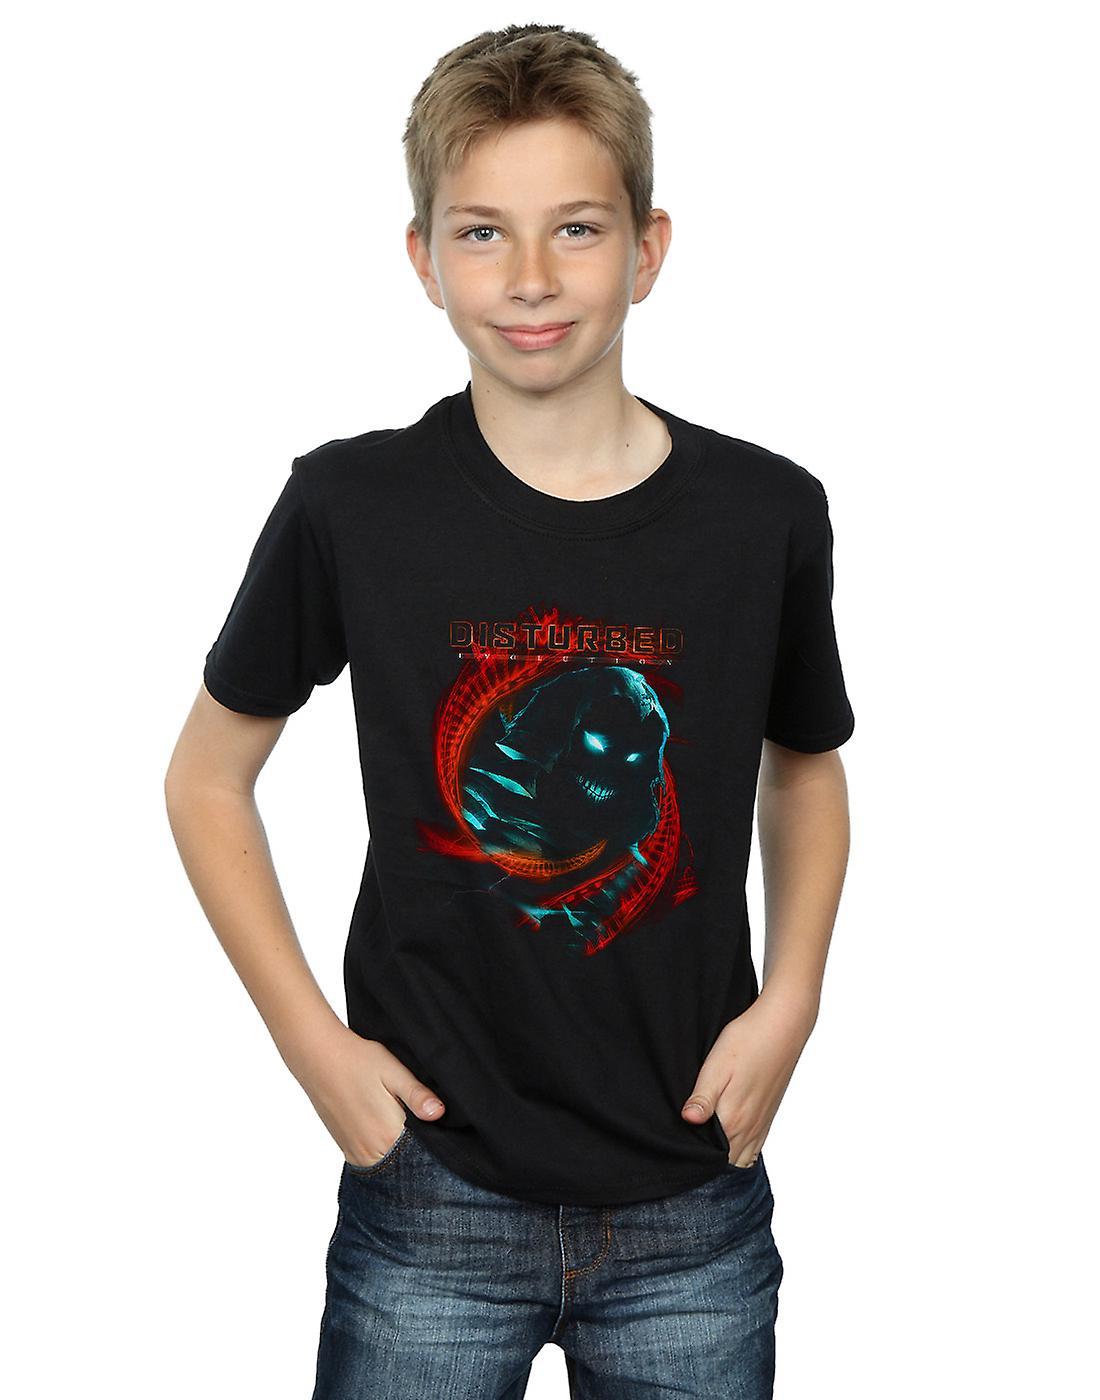 Disturbed Boys DNA Swirl T-Shirt